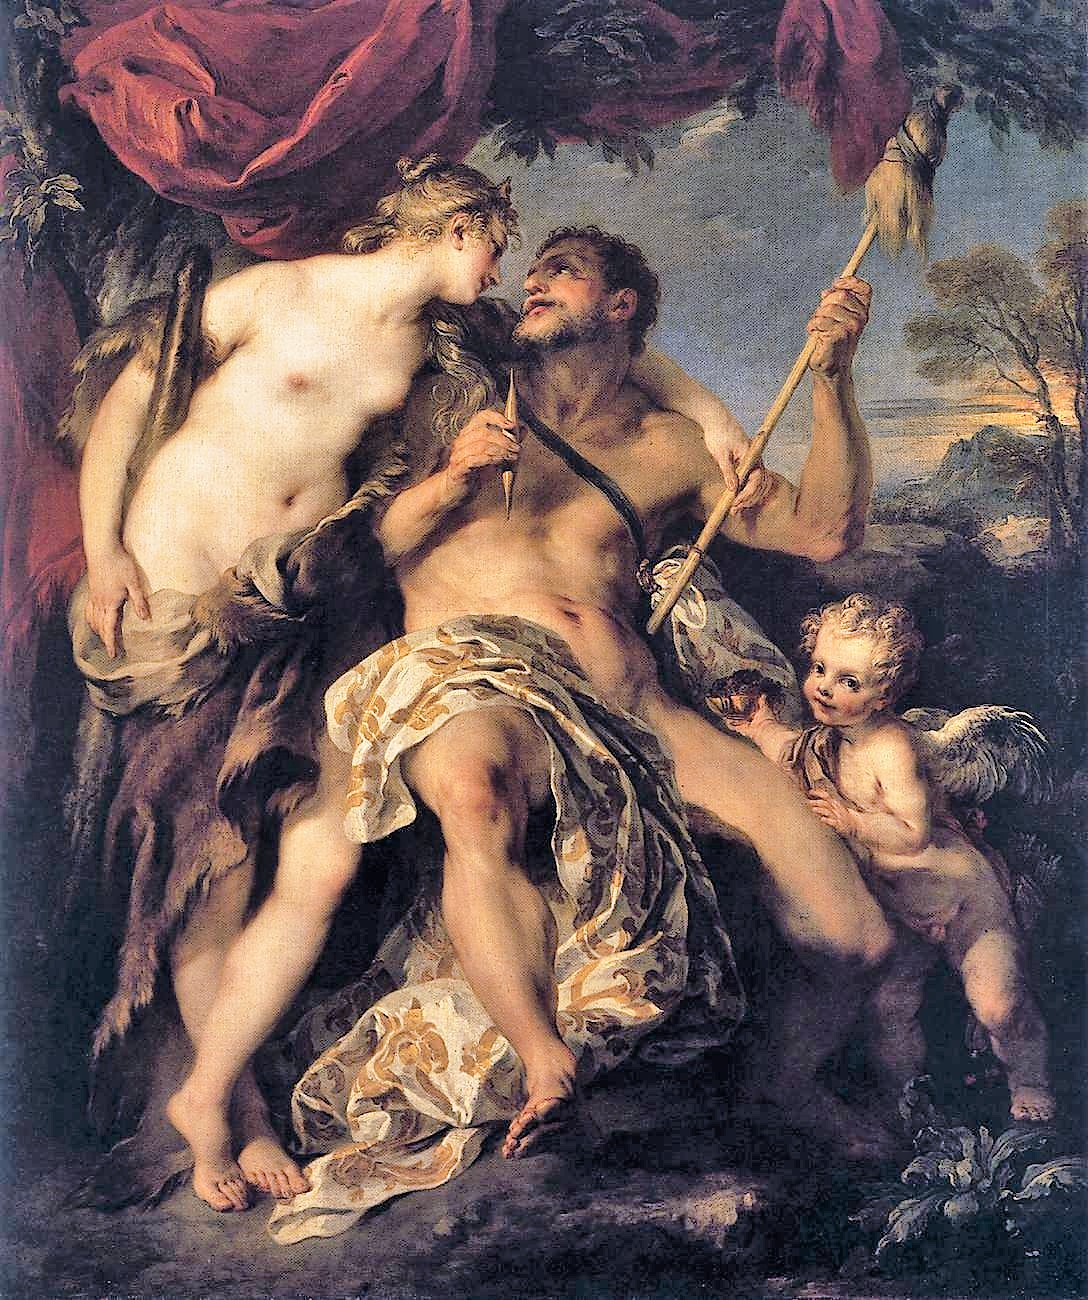 François_Lemoyne 1723 Hercule et Omphale Louvre